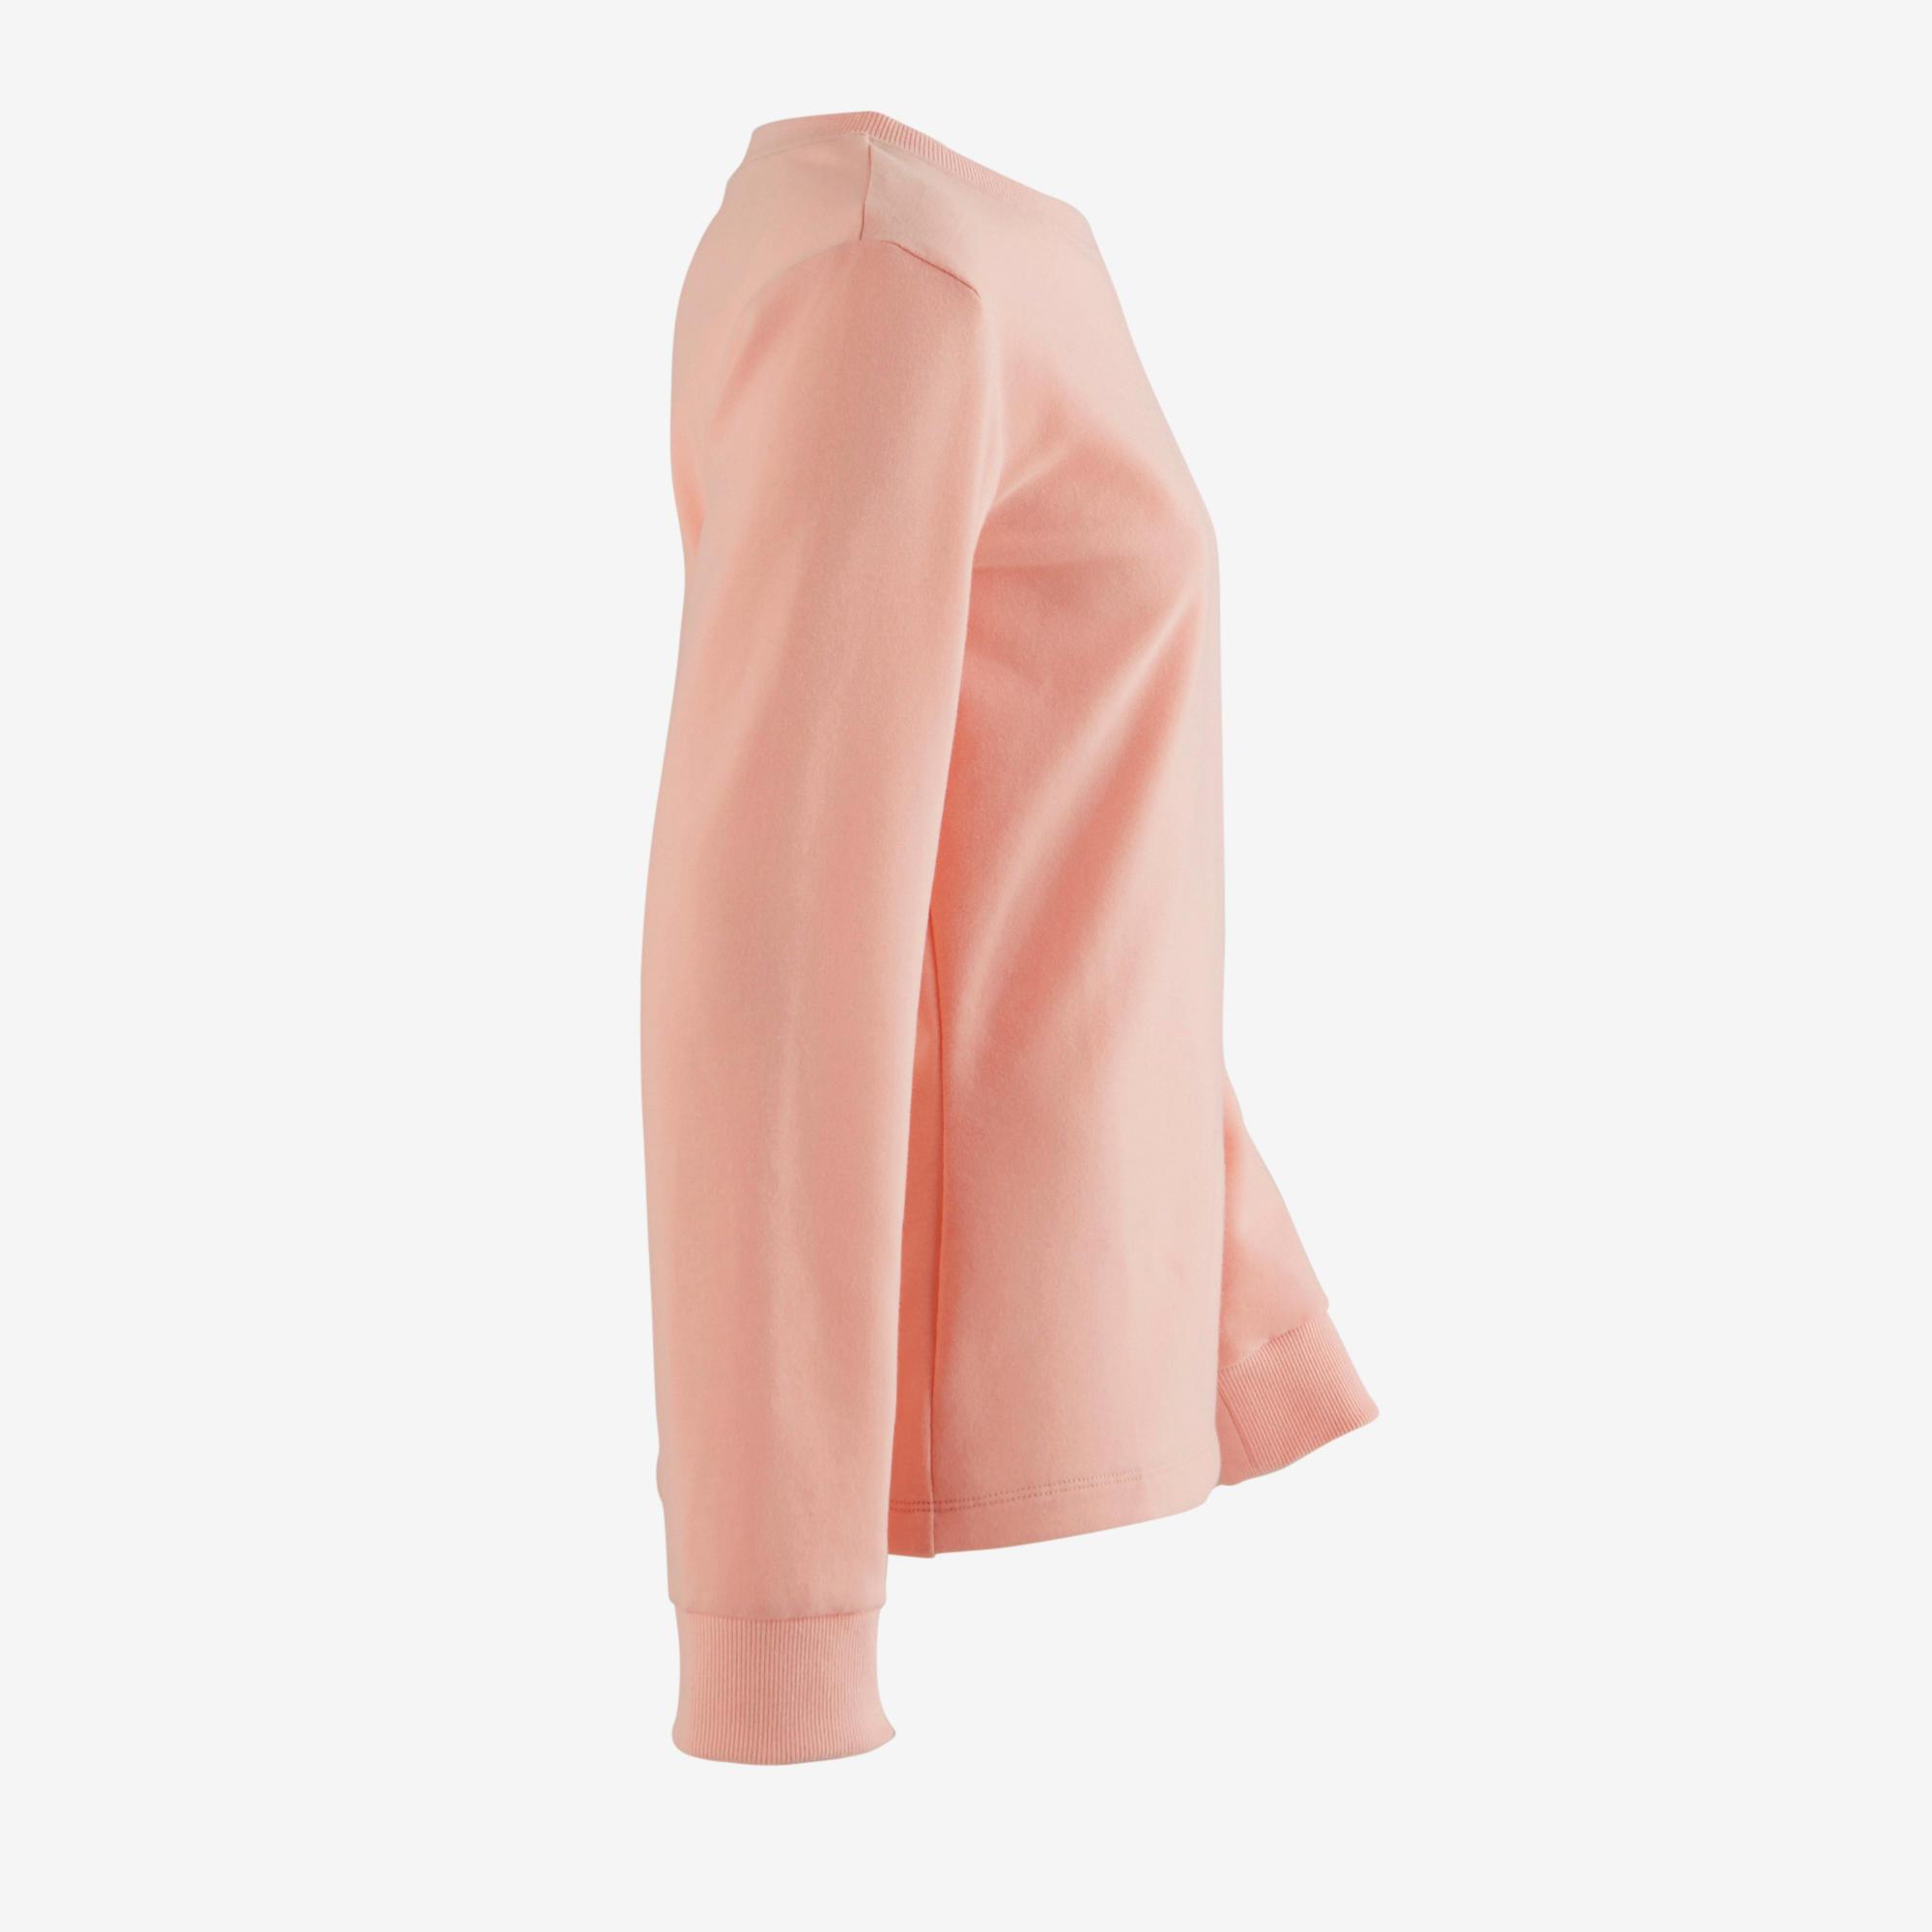 100 Girls' Gym Sweatshirt - Pink